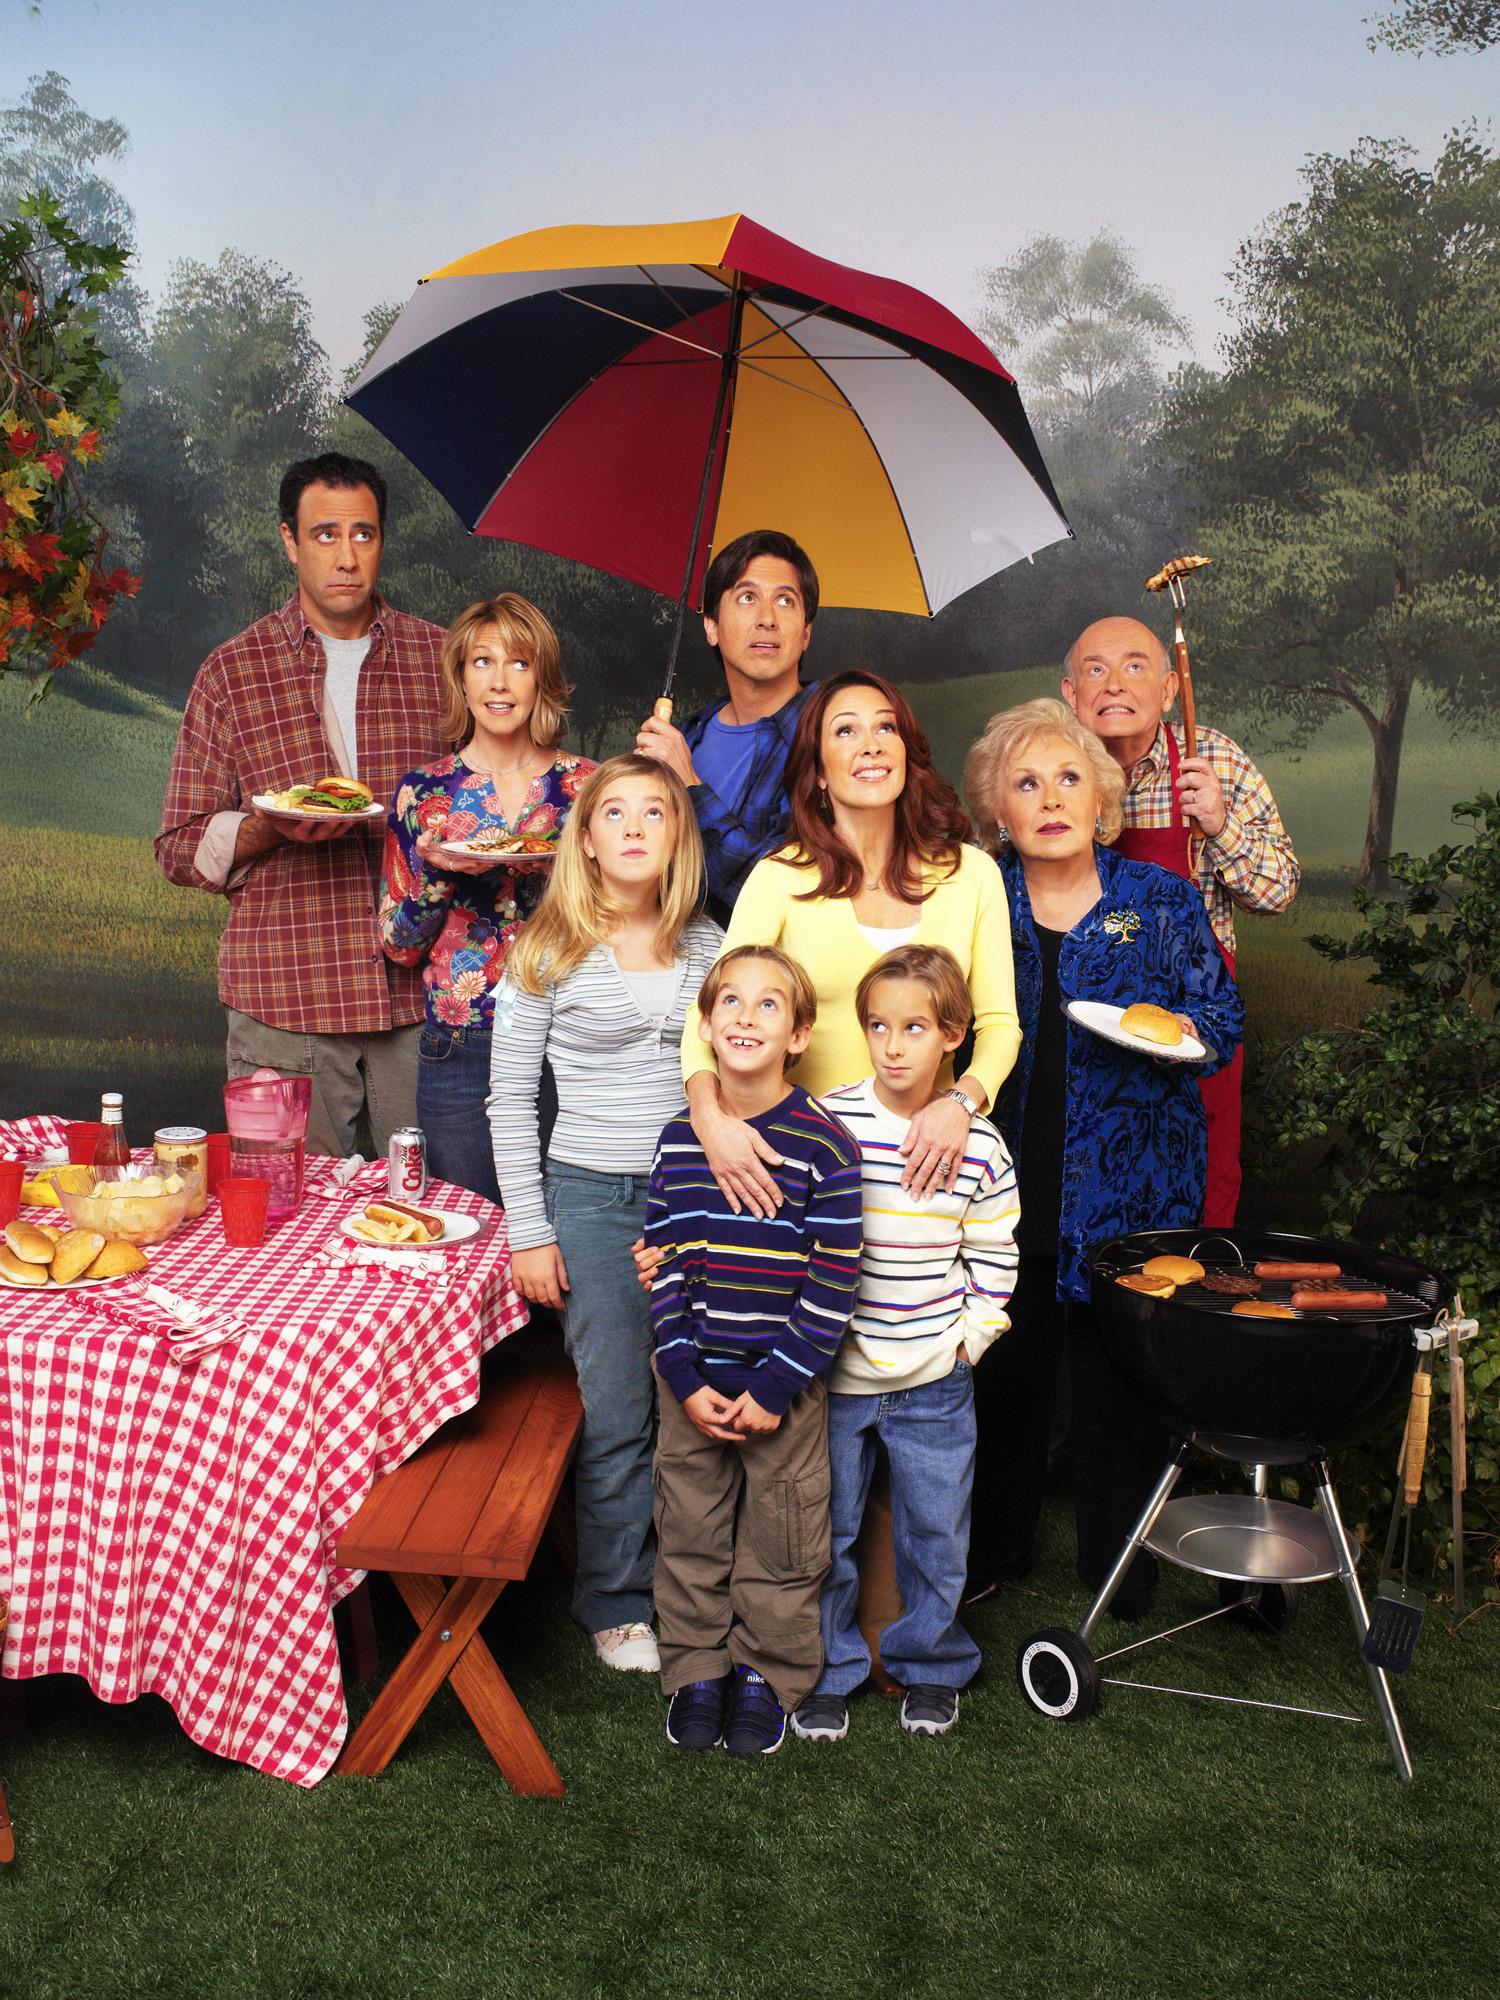 'Everybody Loves Raymond' cast photo with (left to right): Brad Garrett, Monica Horan, Madylin Sweeten, Sawyer Sweeten, Sullivan Sweeten, Ray Romano, Patricia Heaton, Doris Roberts, and Peter Boyle